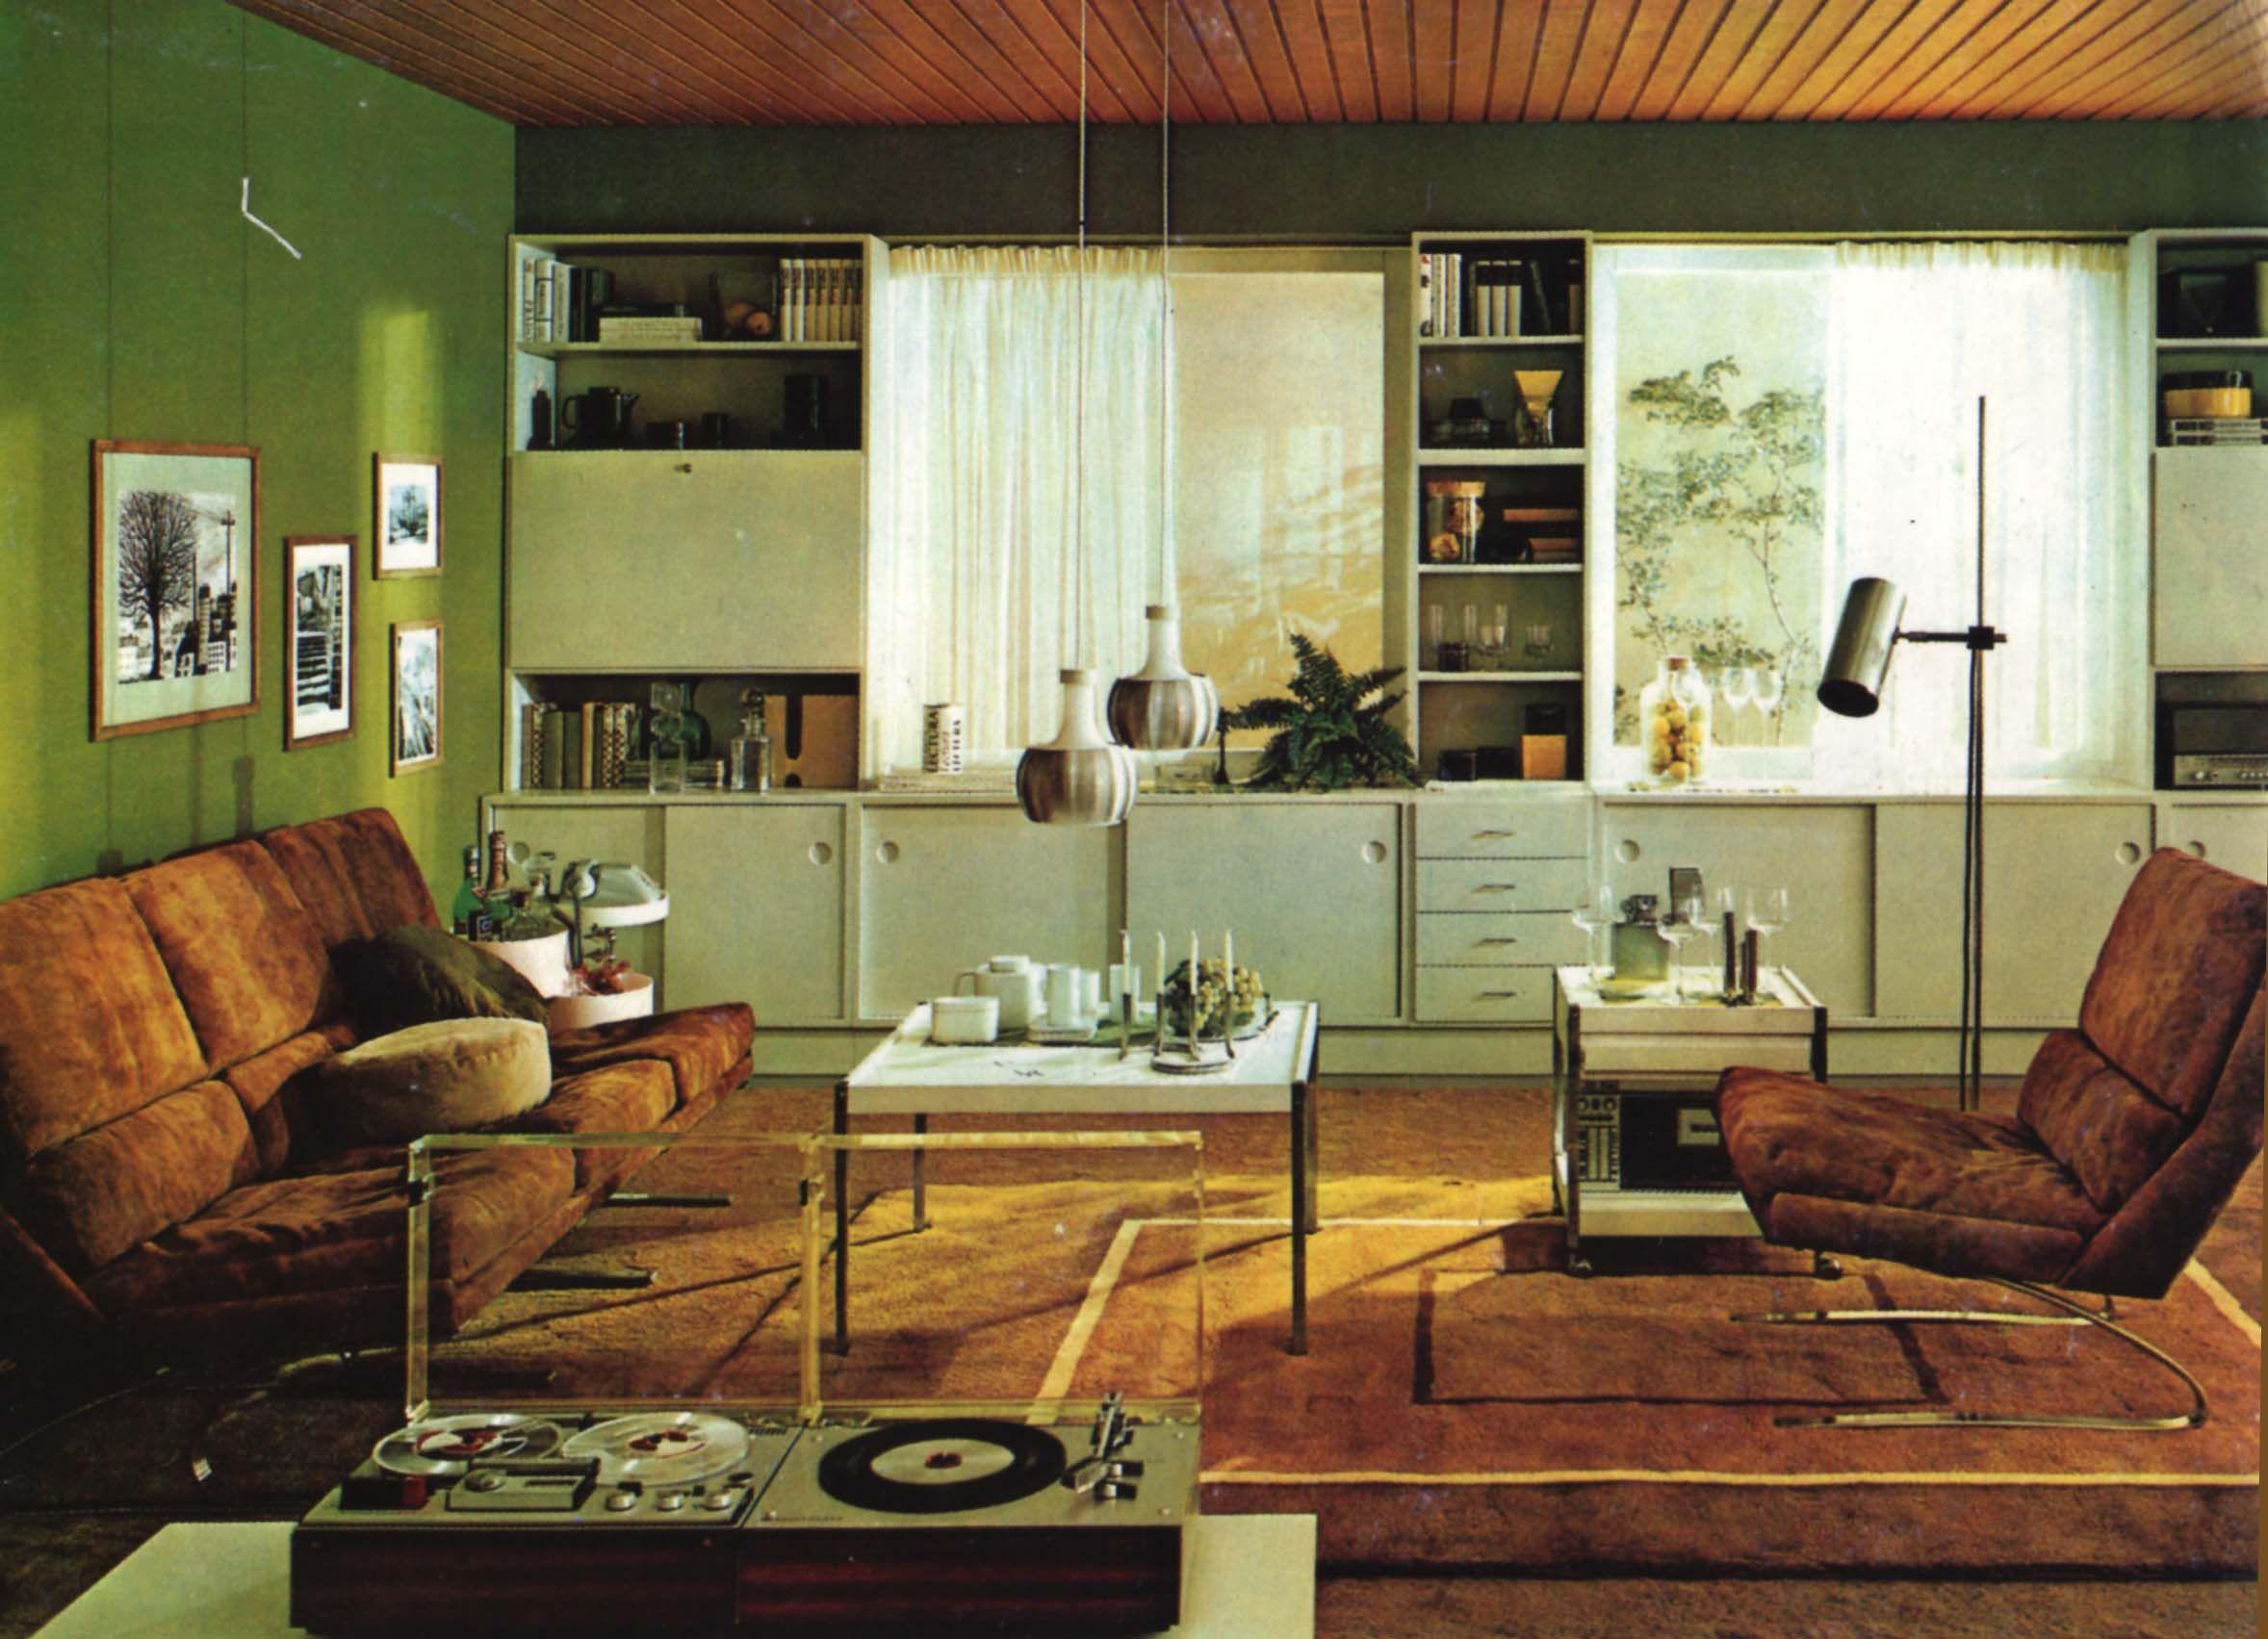 Space Age Furniture Retro Interior Classic Space Age Furniture Retro Pinterest